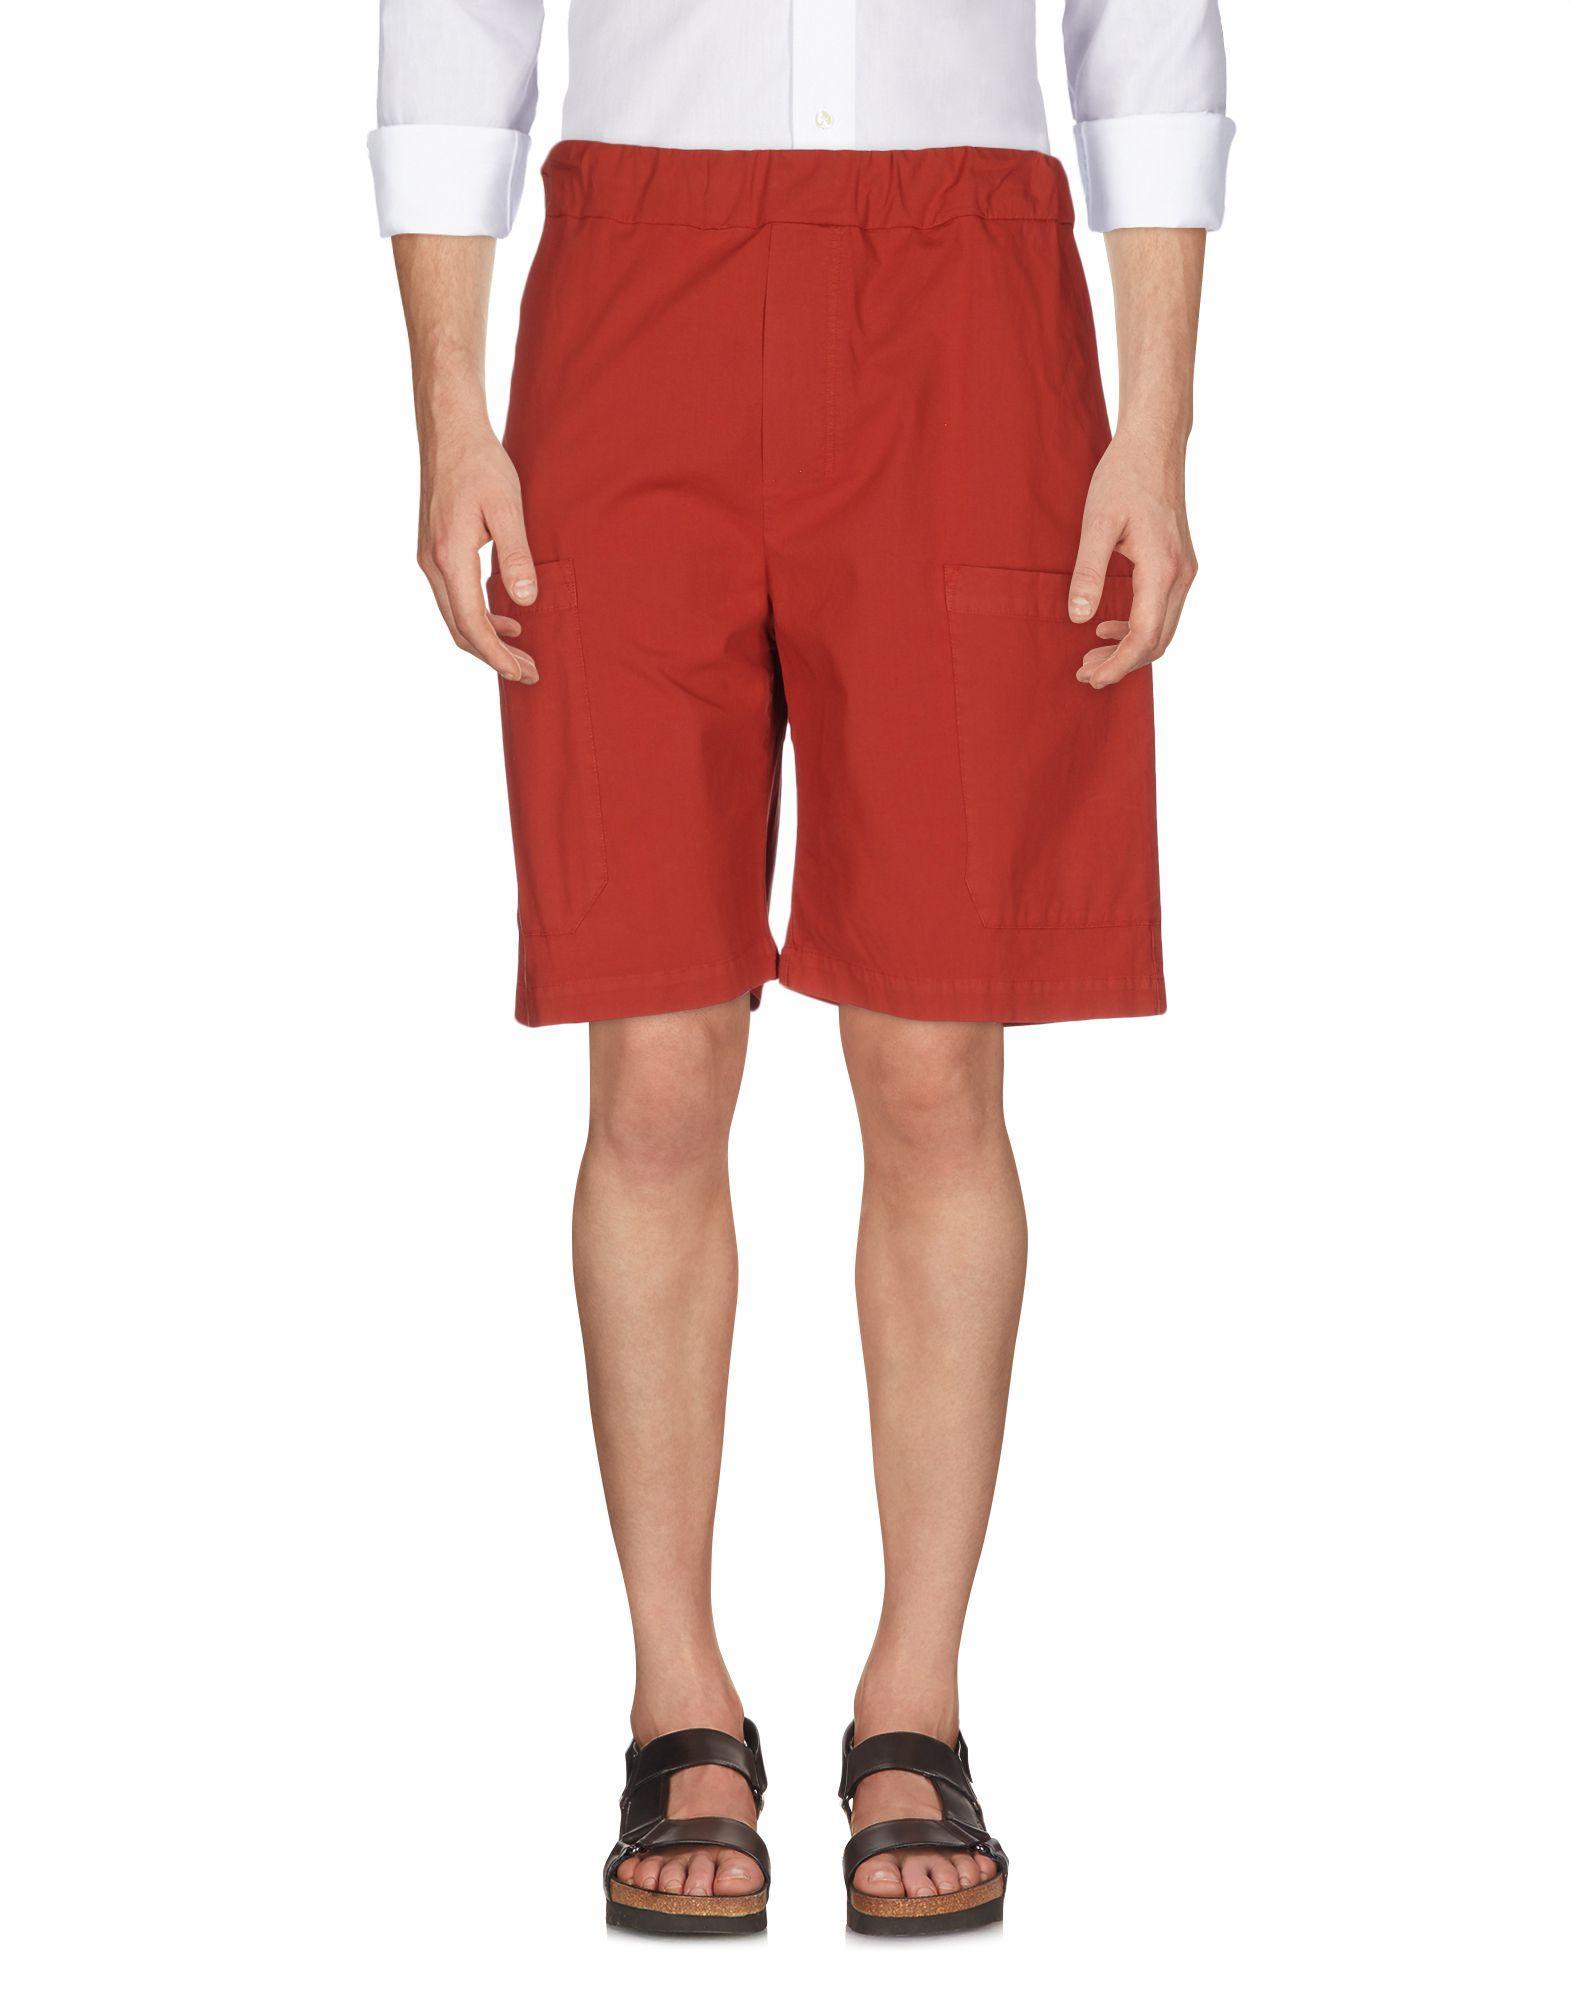 Low Brand Shorts & Bermuda In Brick Red